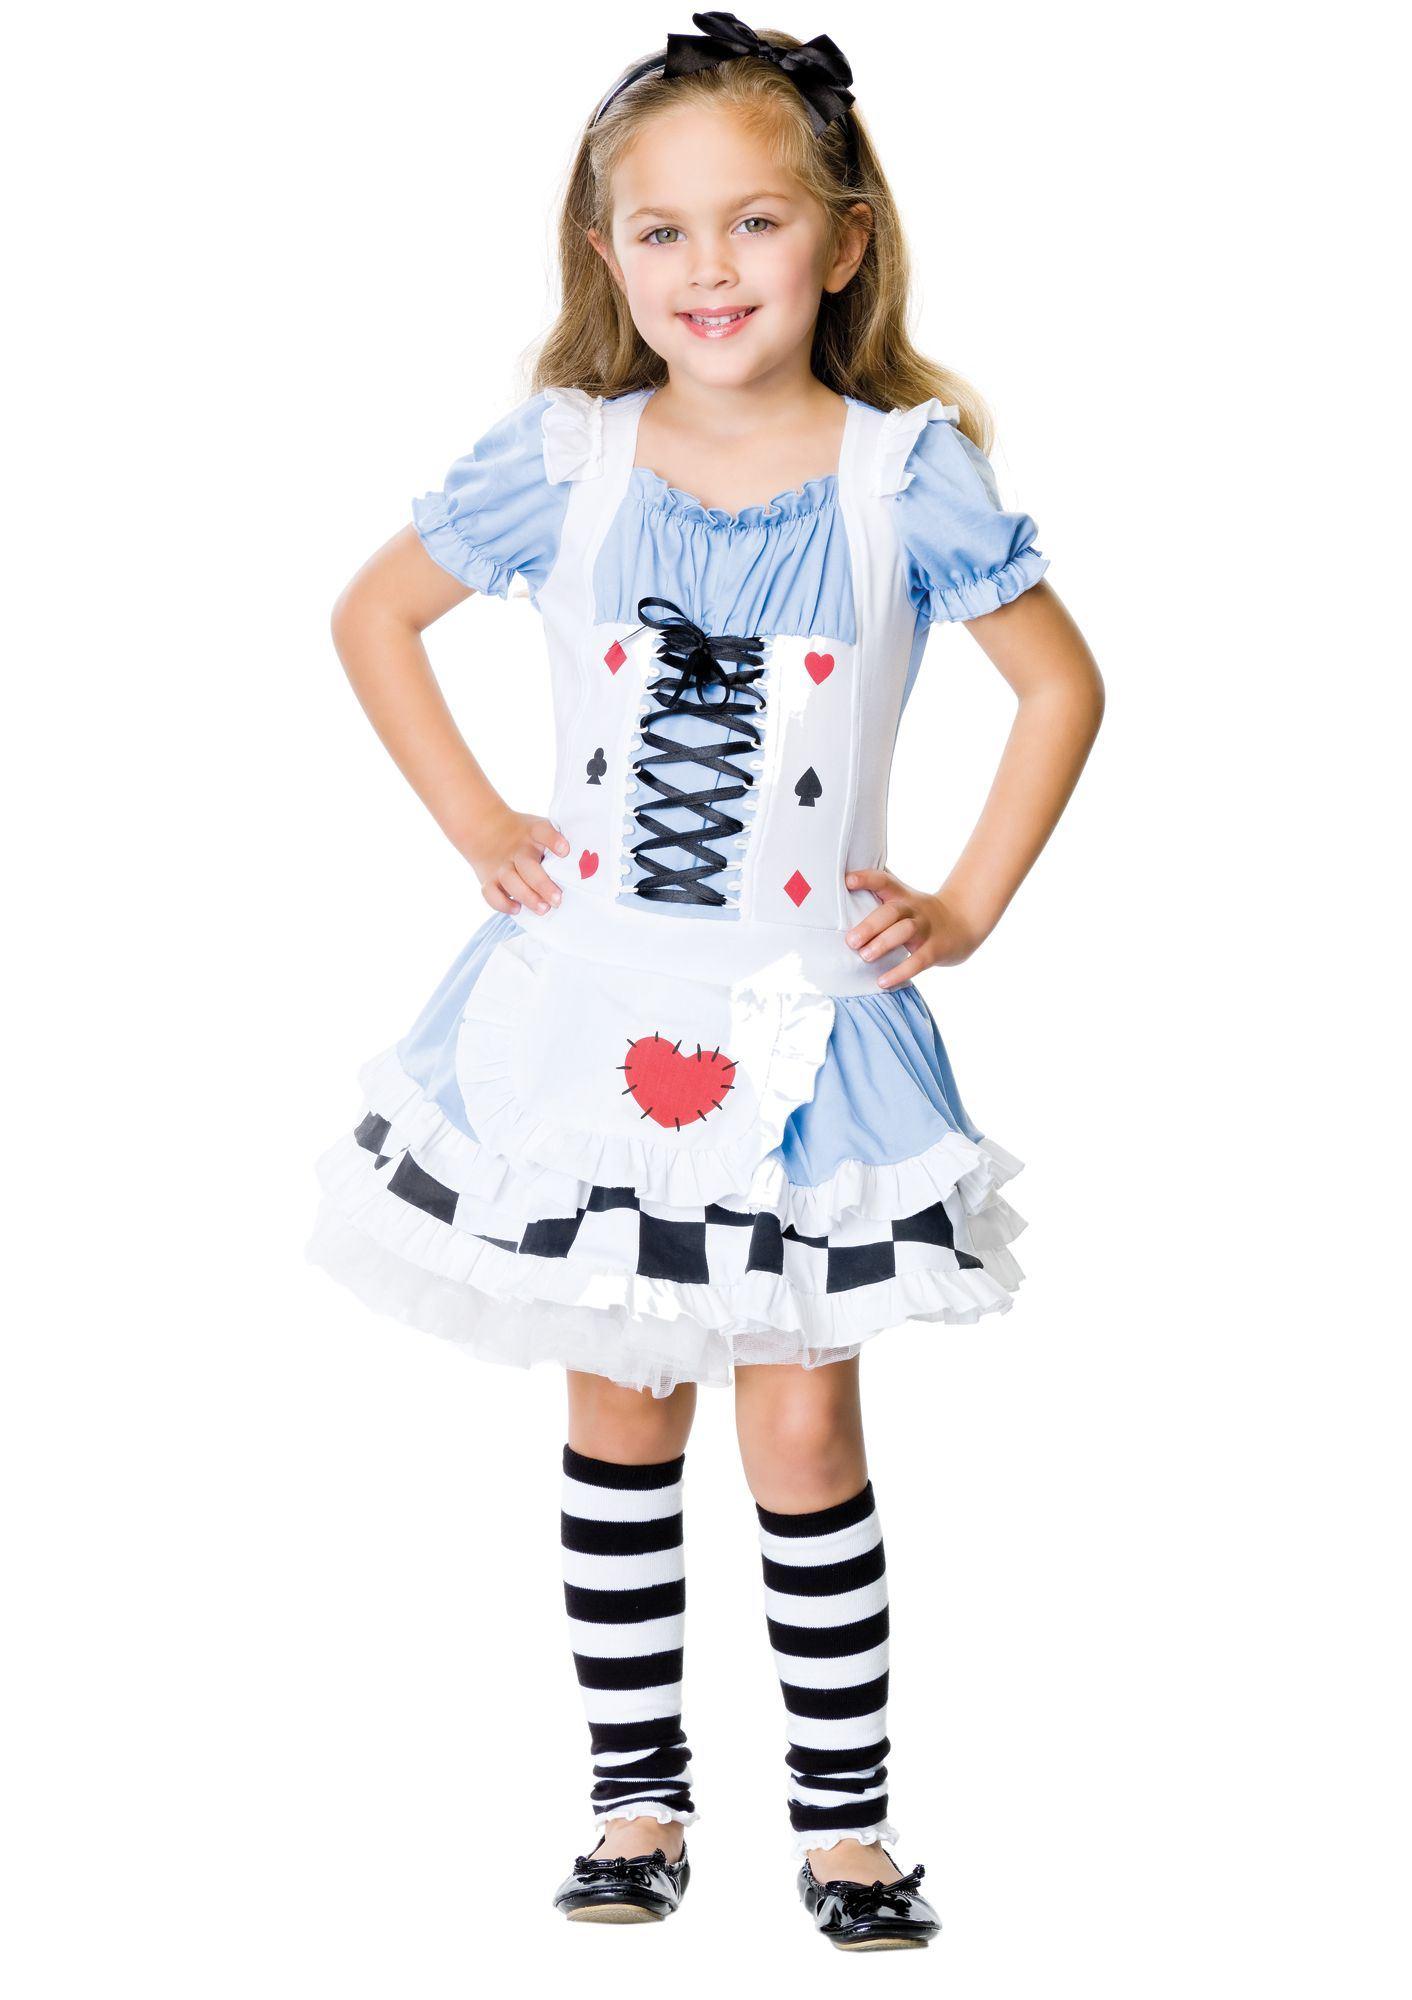 Cute Little Girl Halloween Costume Ideas